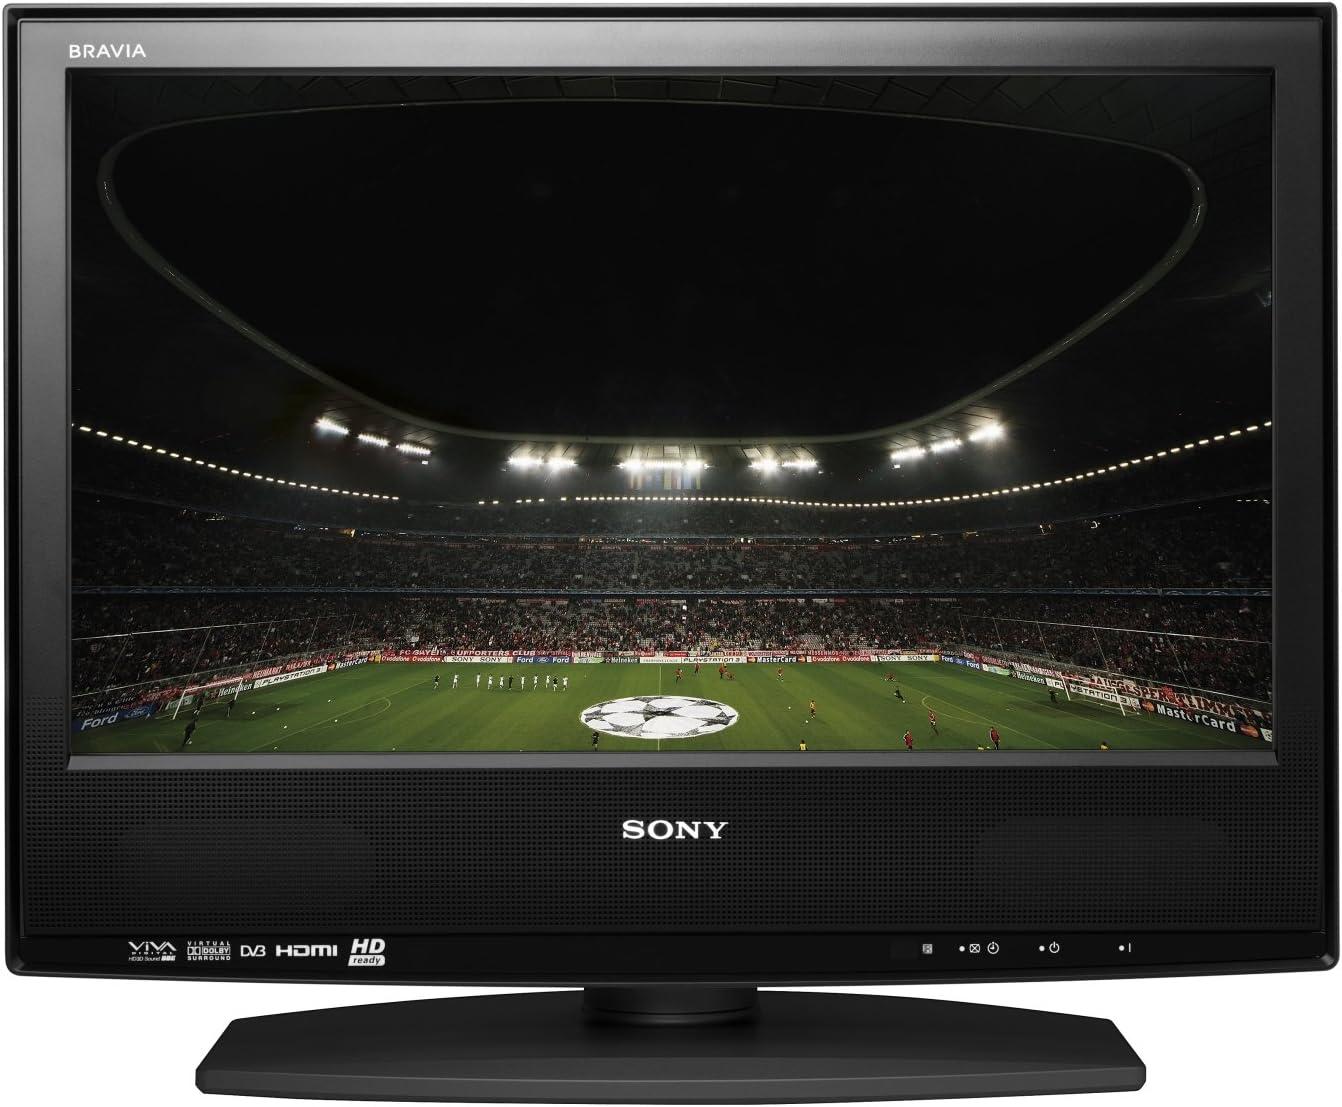 Sony KDL-20S4000E - Televisión HD, Pantalla LCD 20 pulgadas: Amazon.es: Electrónica